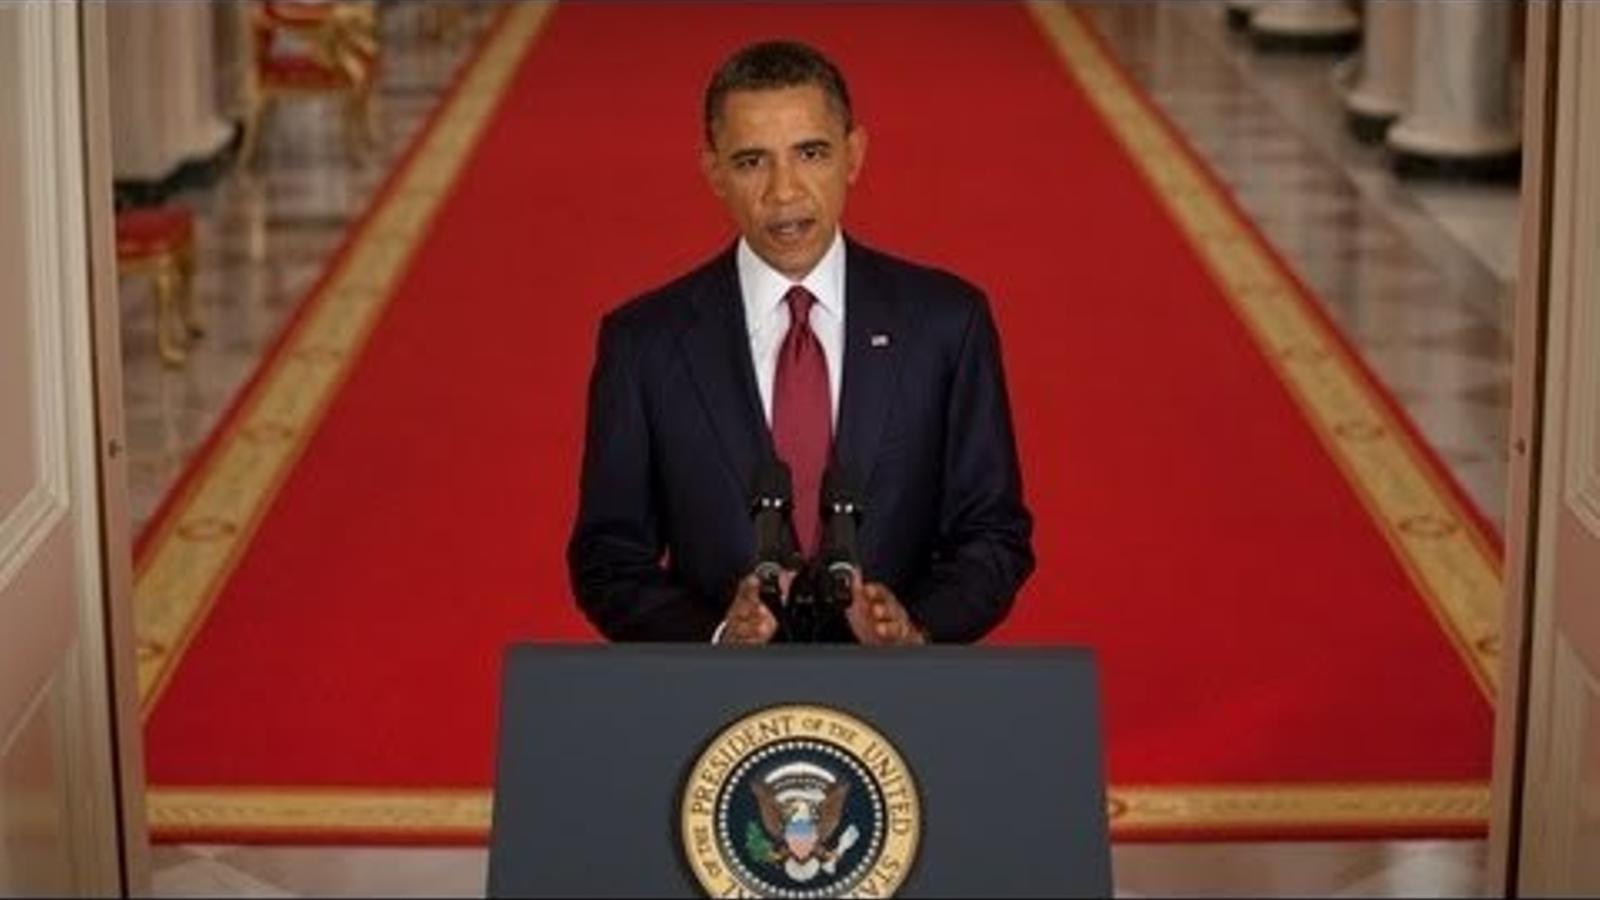 El president confirma la mort d'Osama Bin laden